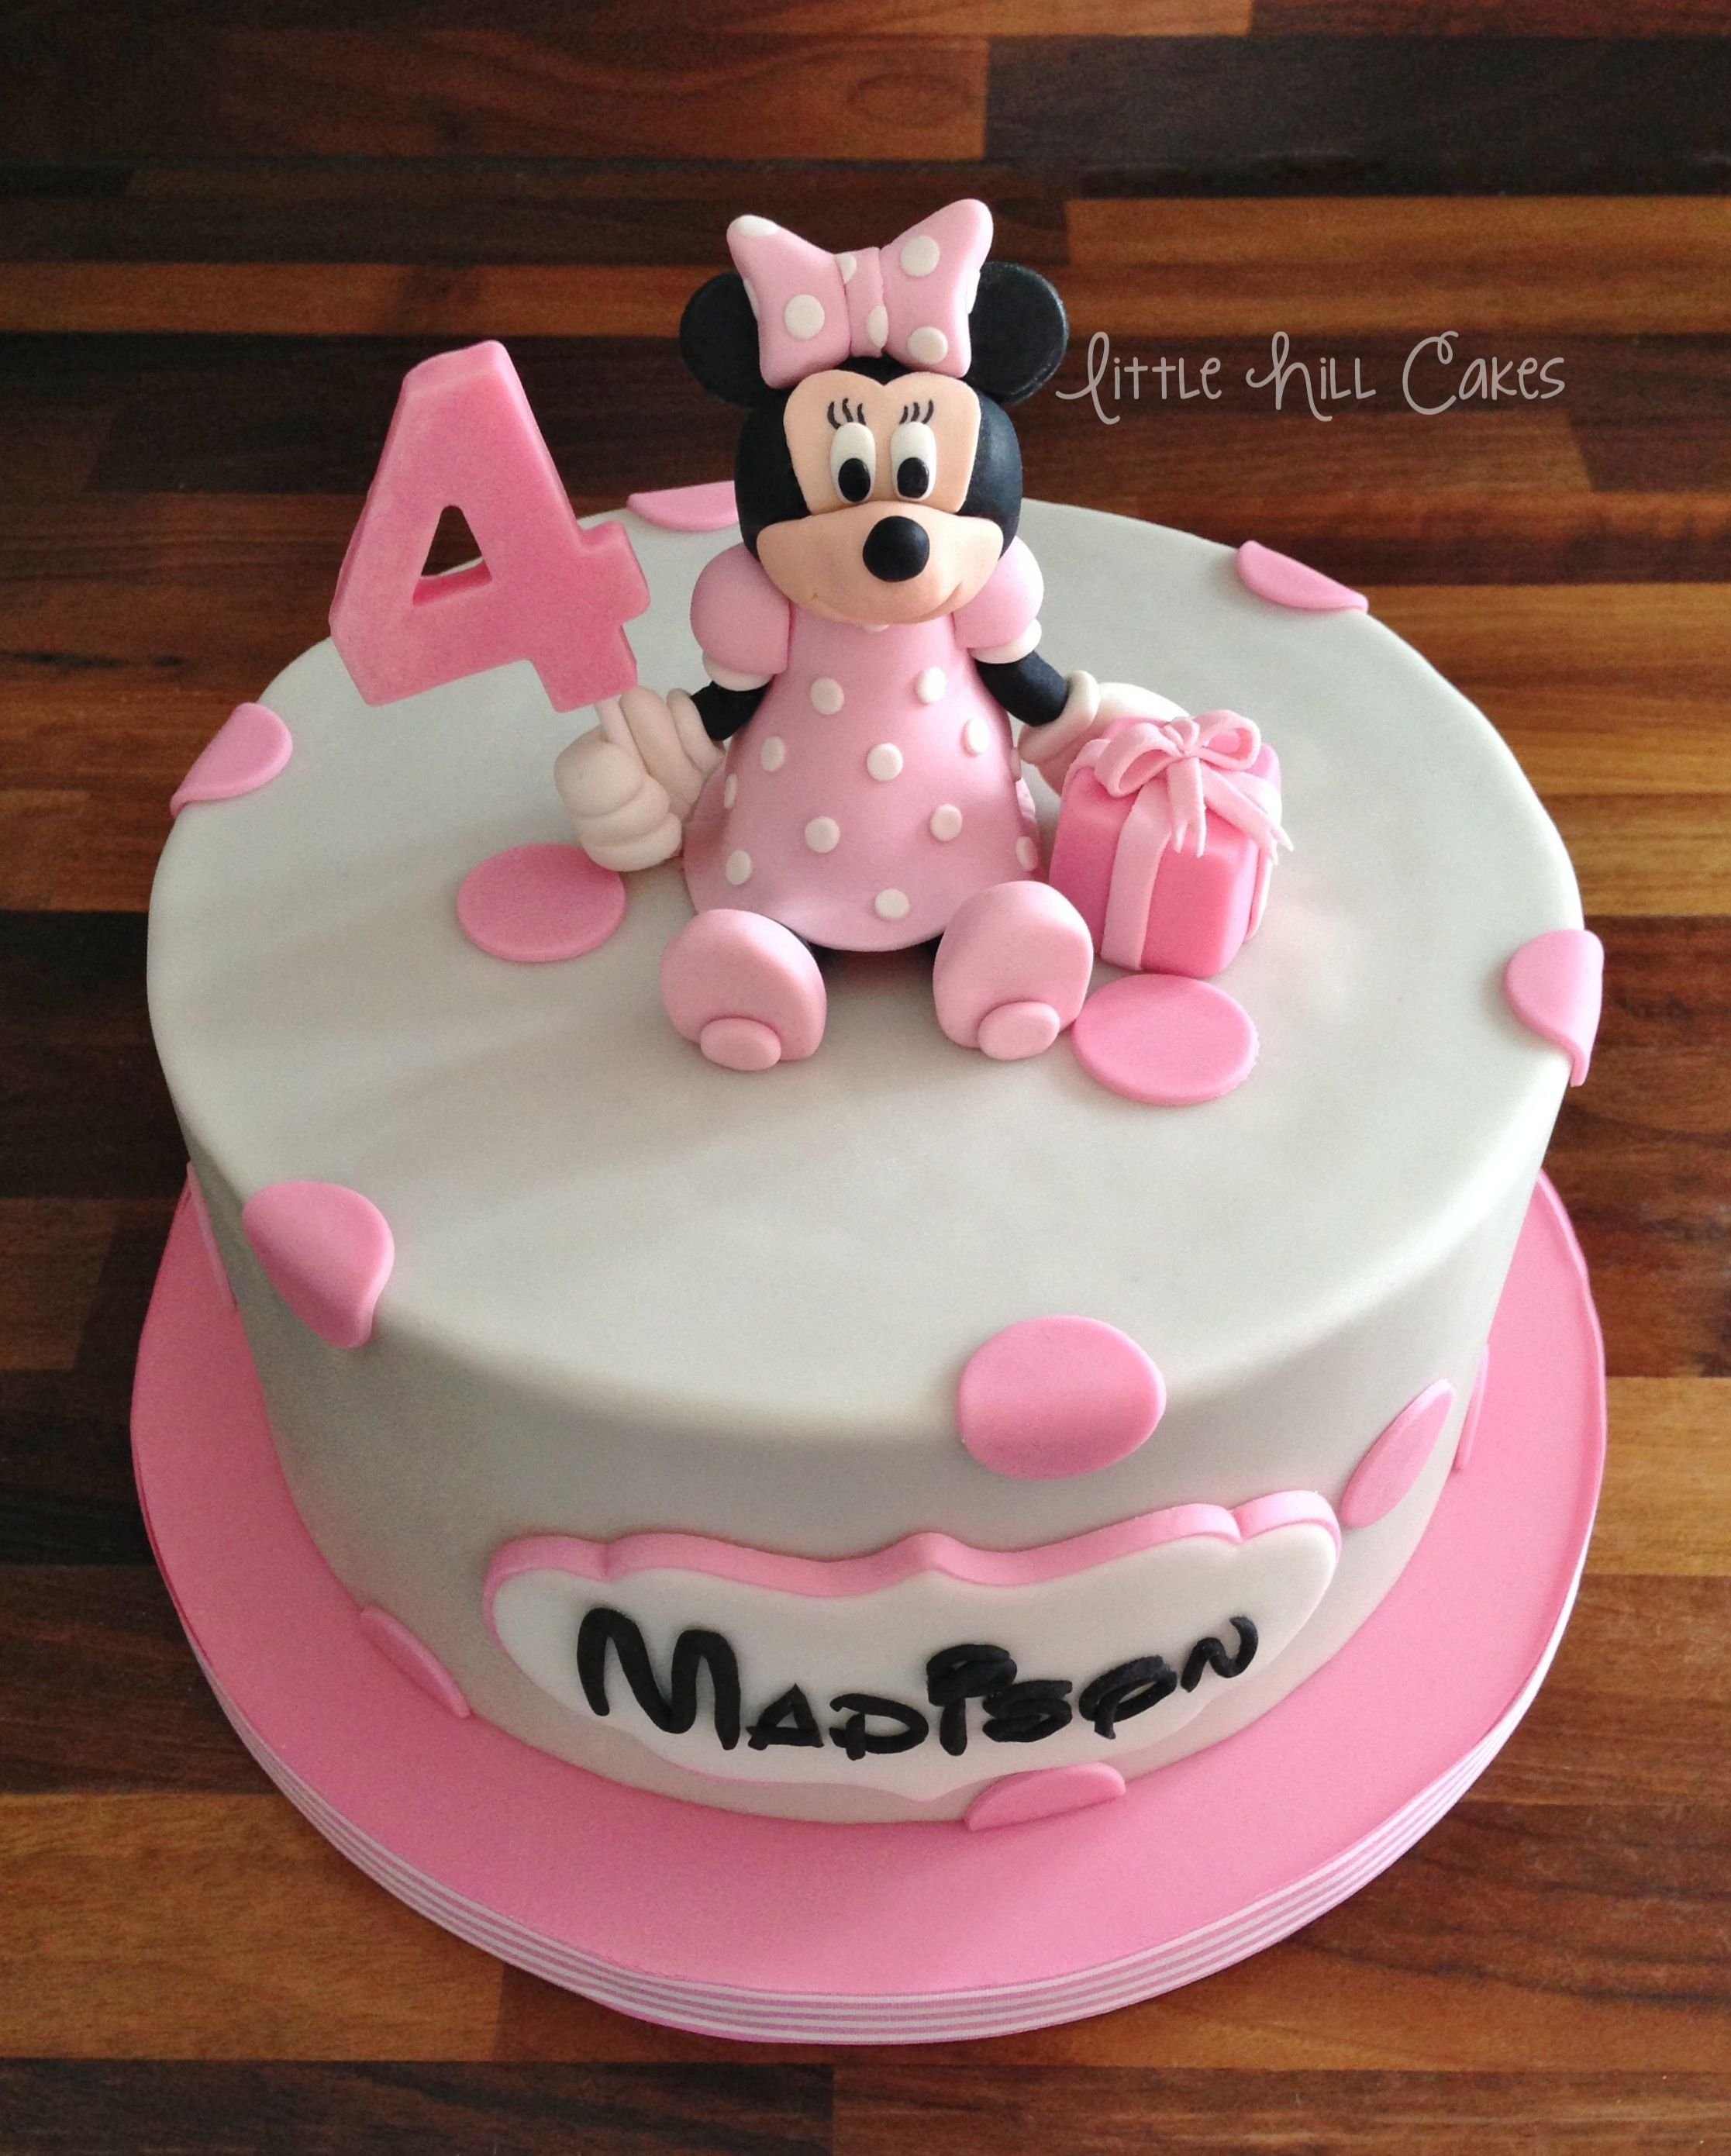 Awe Inspiring Minnie Mouse Birthday Cake With Images Minnie Mouse Birthday Personalised Birthday Cards Paralily Jamesorg